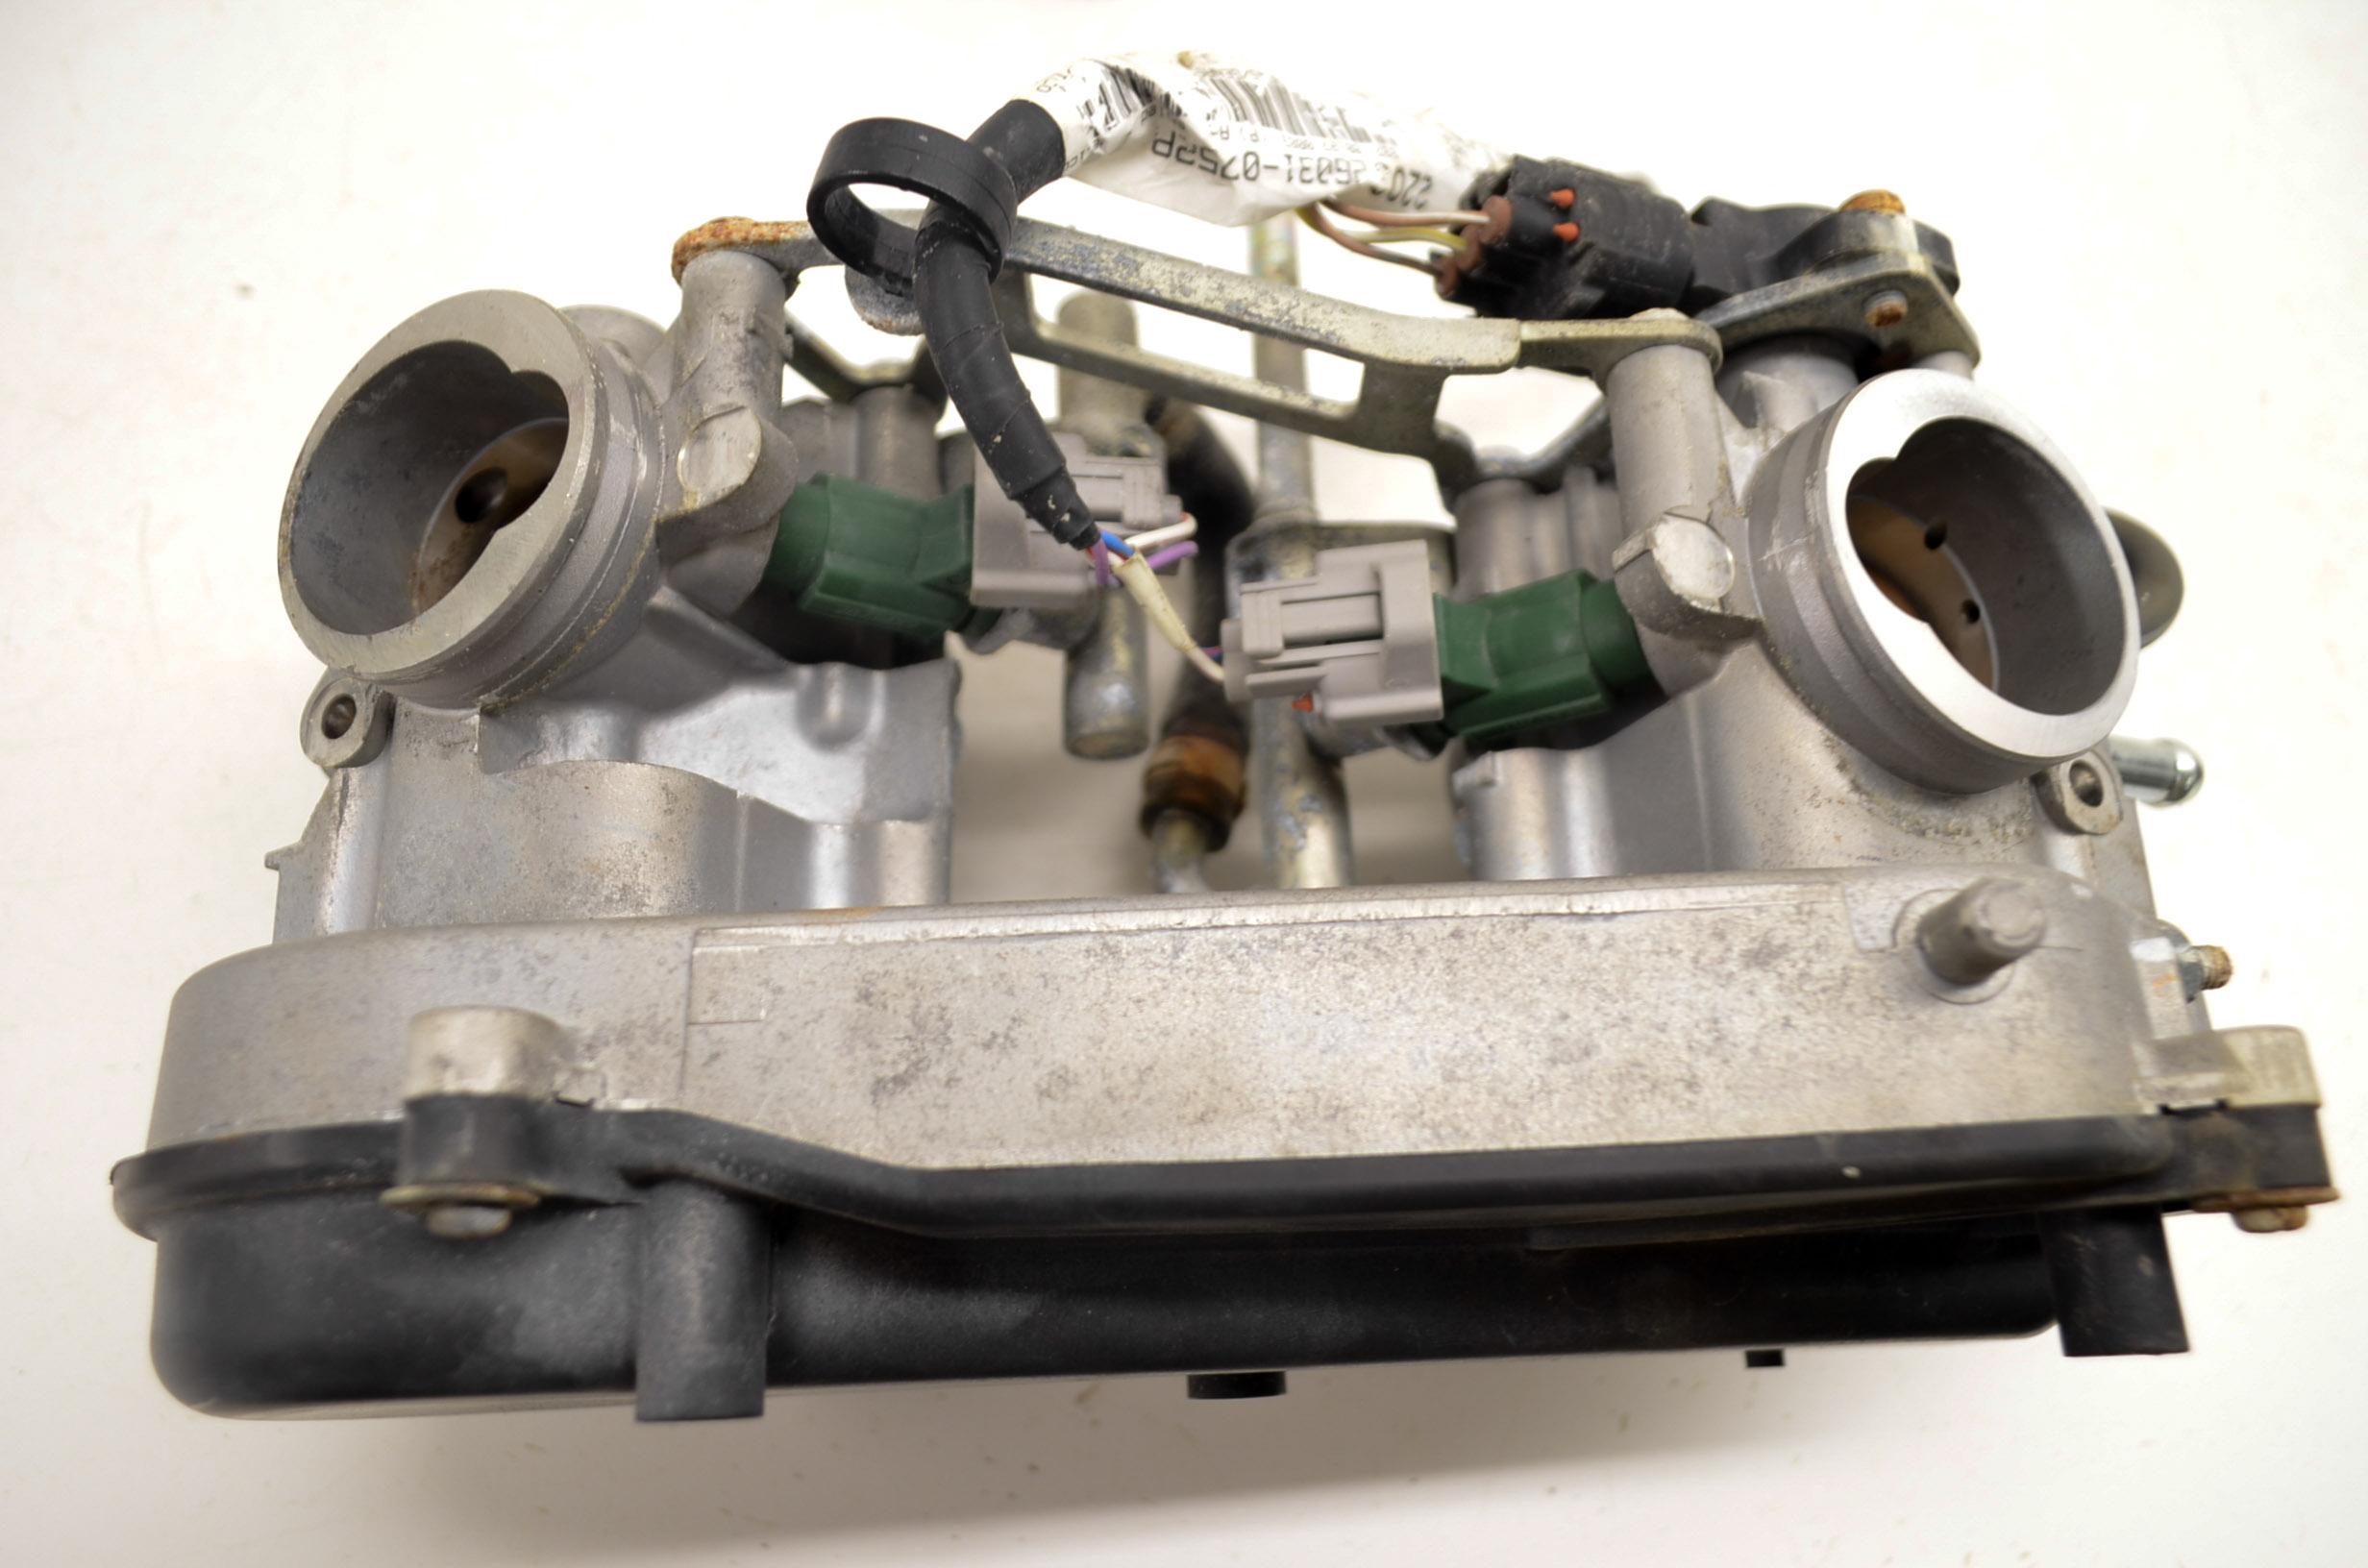 2005 Kawasaki Brute Force 750 Carburetor Wiring Diagram 15 Throttle Body Fuel Injectors Kvf750 4x4i